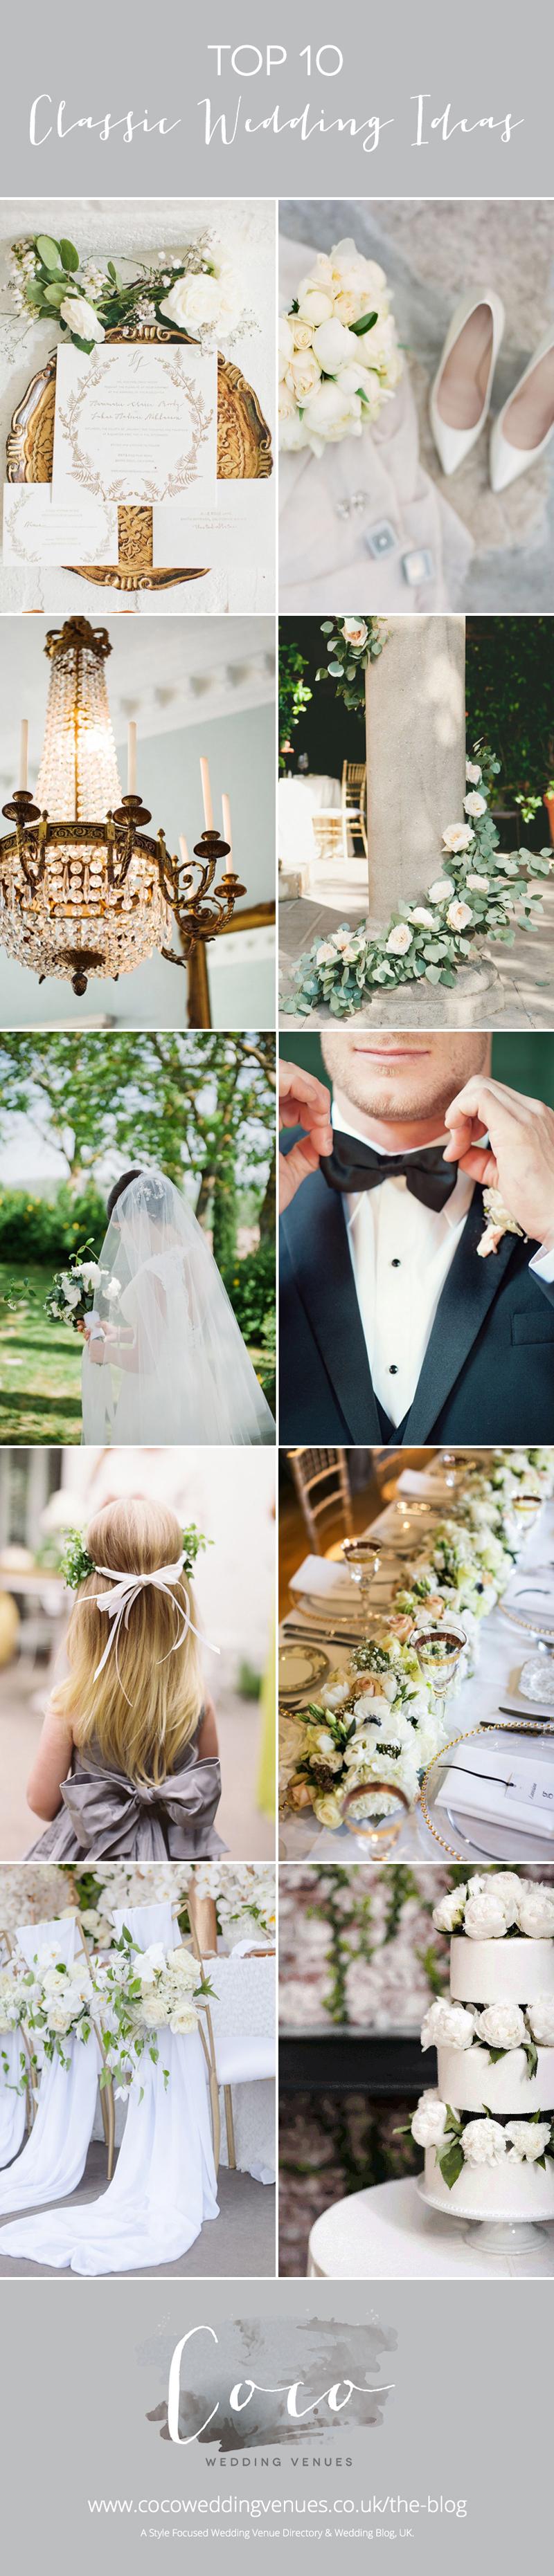 classic-elegance-wedding-inspiration-uk-wedding-venue-directory-coco-wedding-venues-pin-it